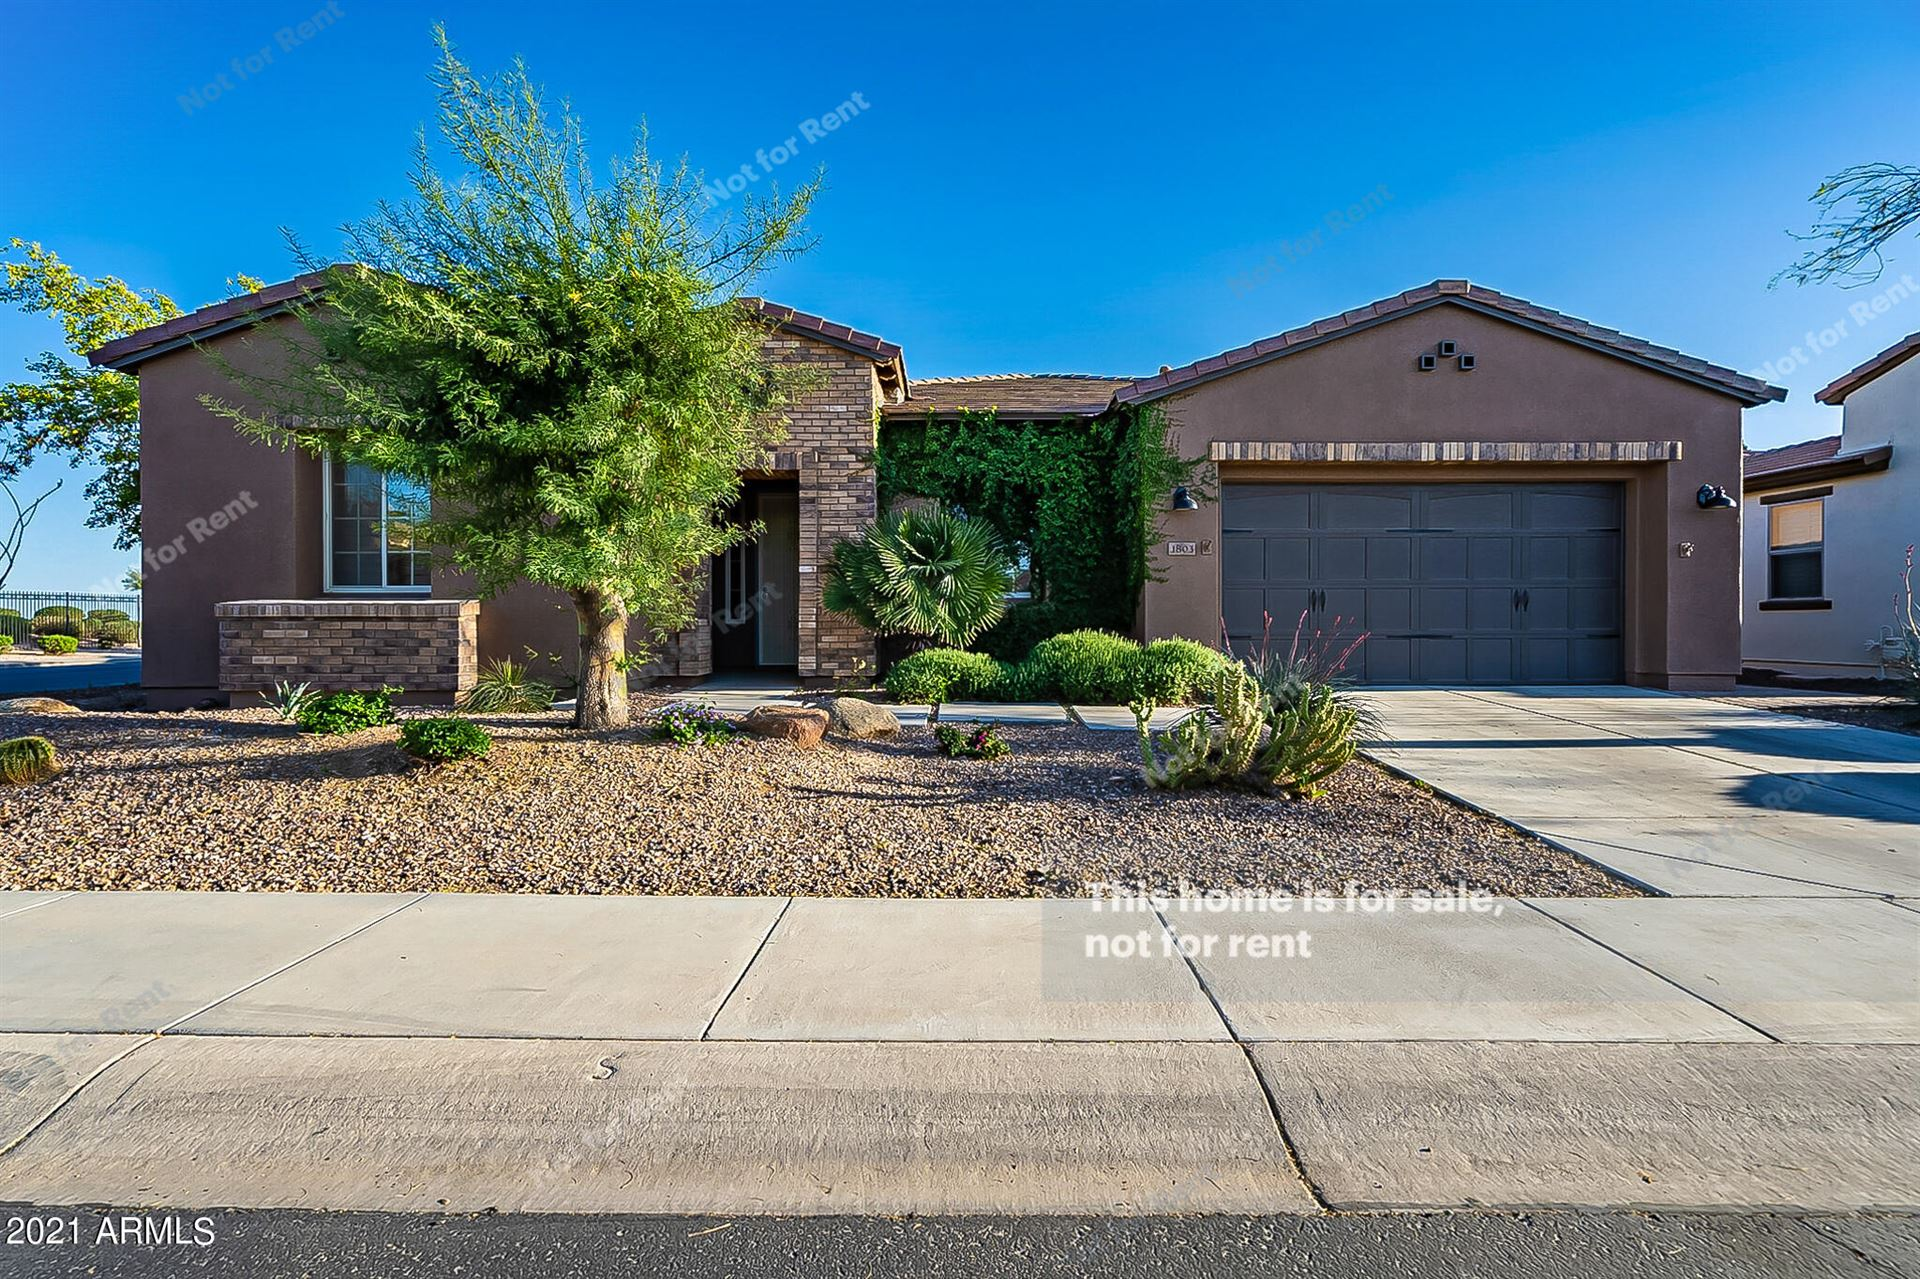 1803 E LADDOOS Avenue, San Tan Valley, AZ 85140 - MLS#: 6219503